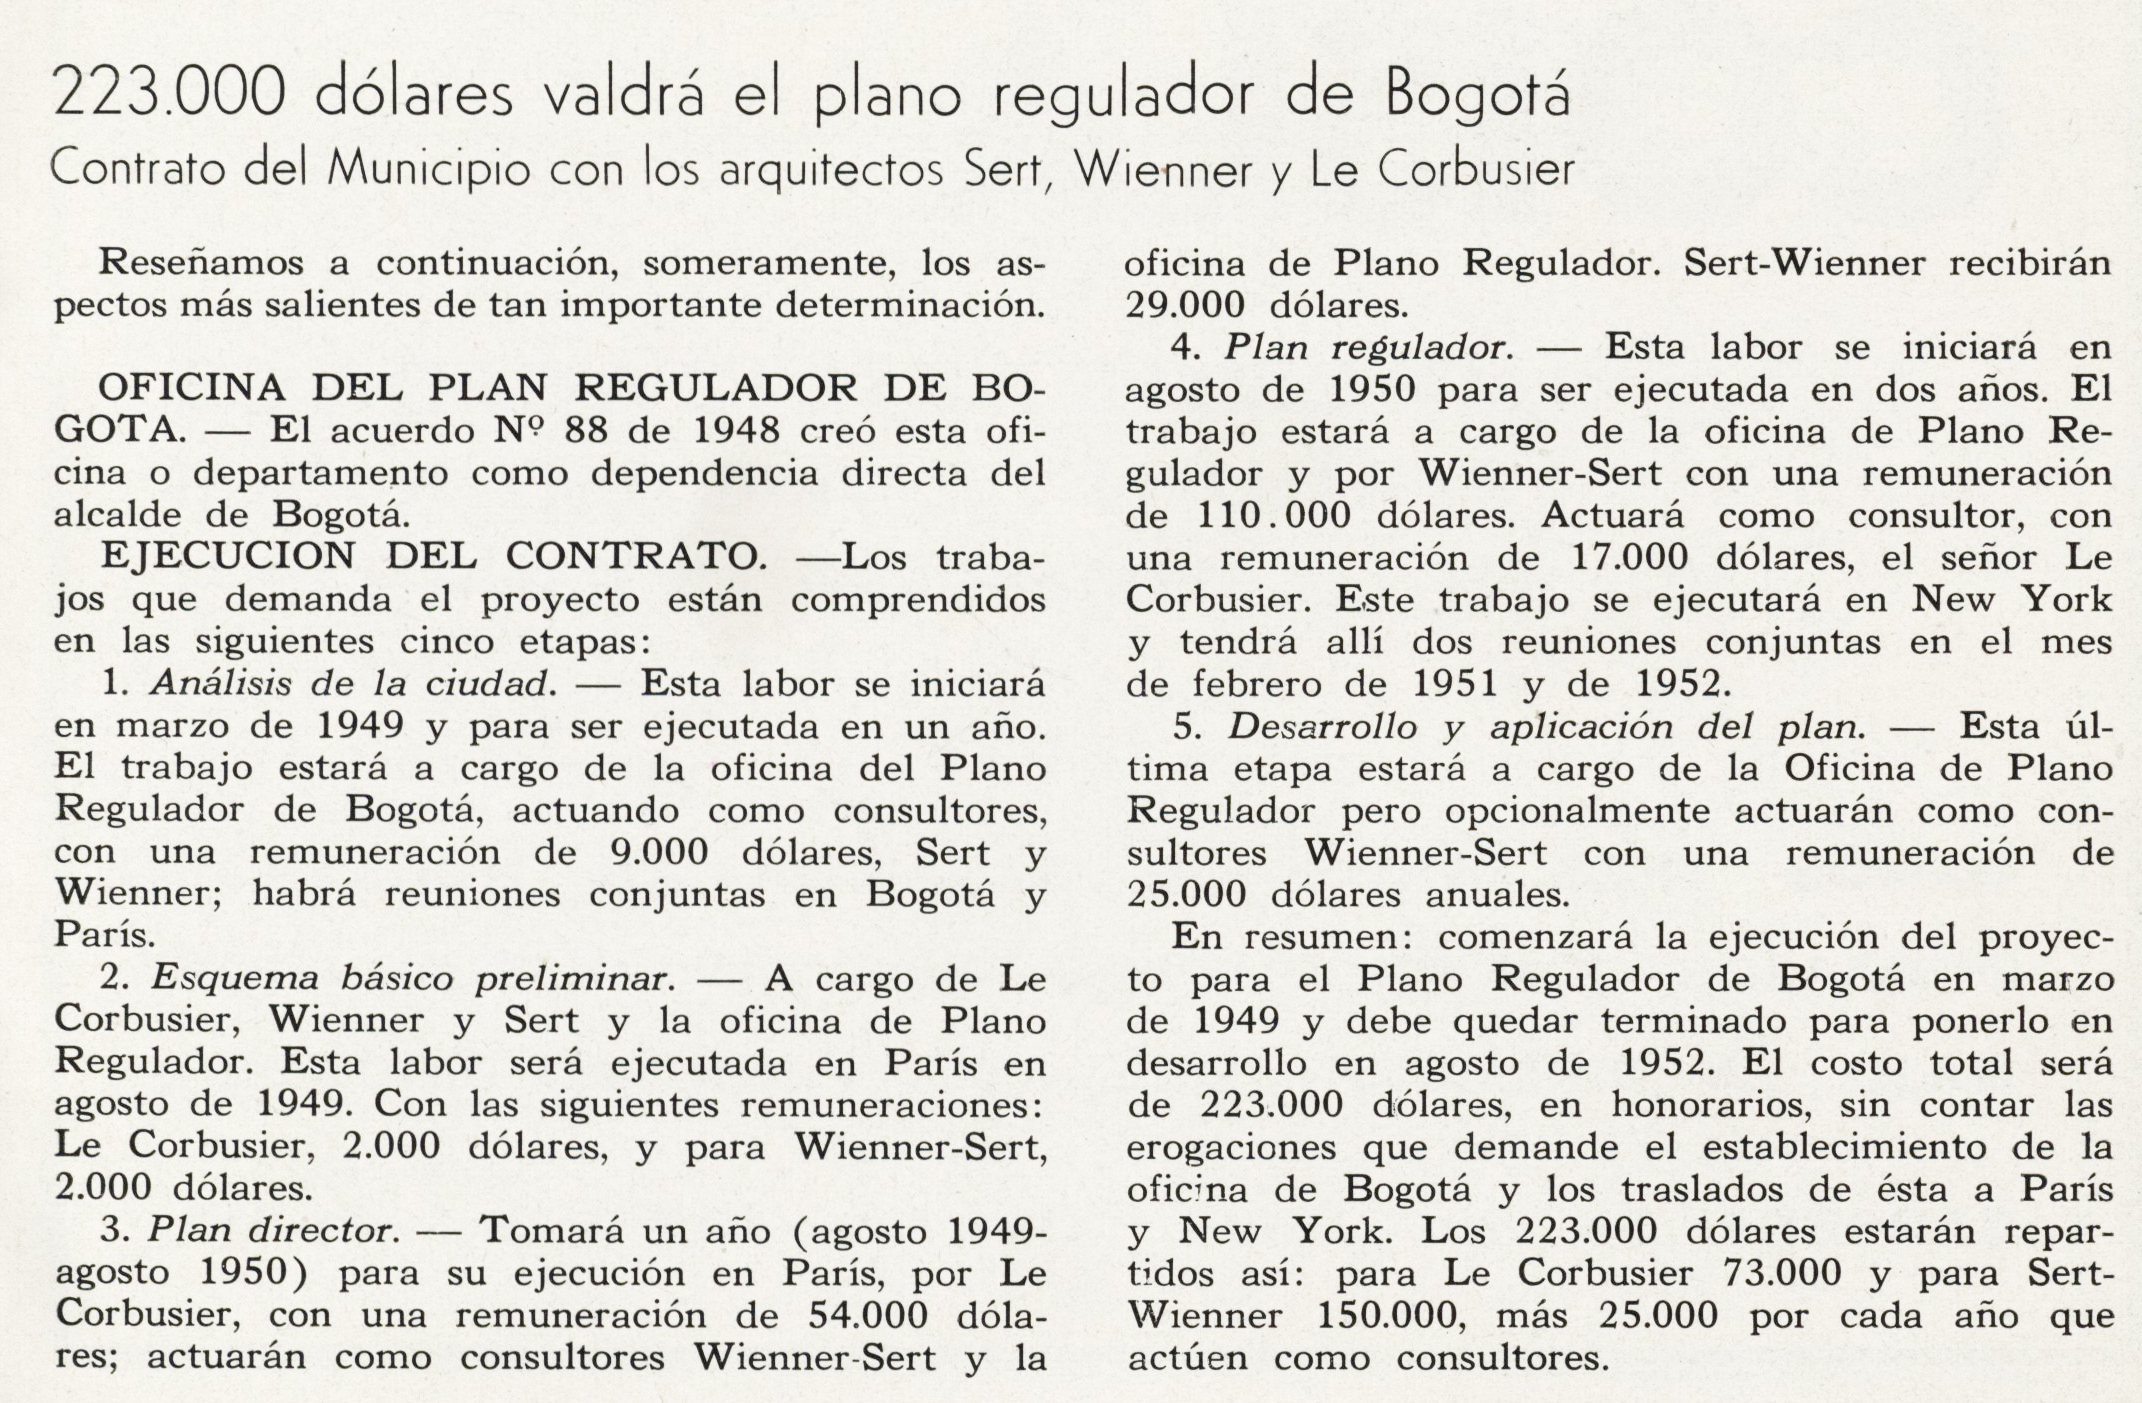 fig. 54 PROA 21-223000 DOLARES-35.jpg